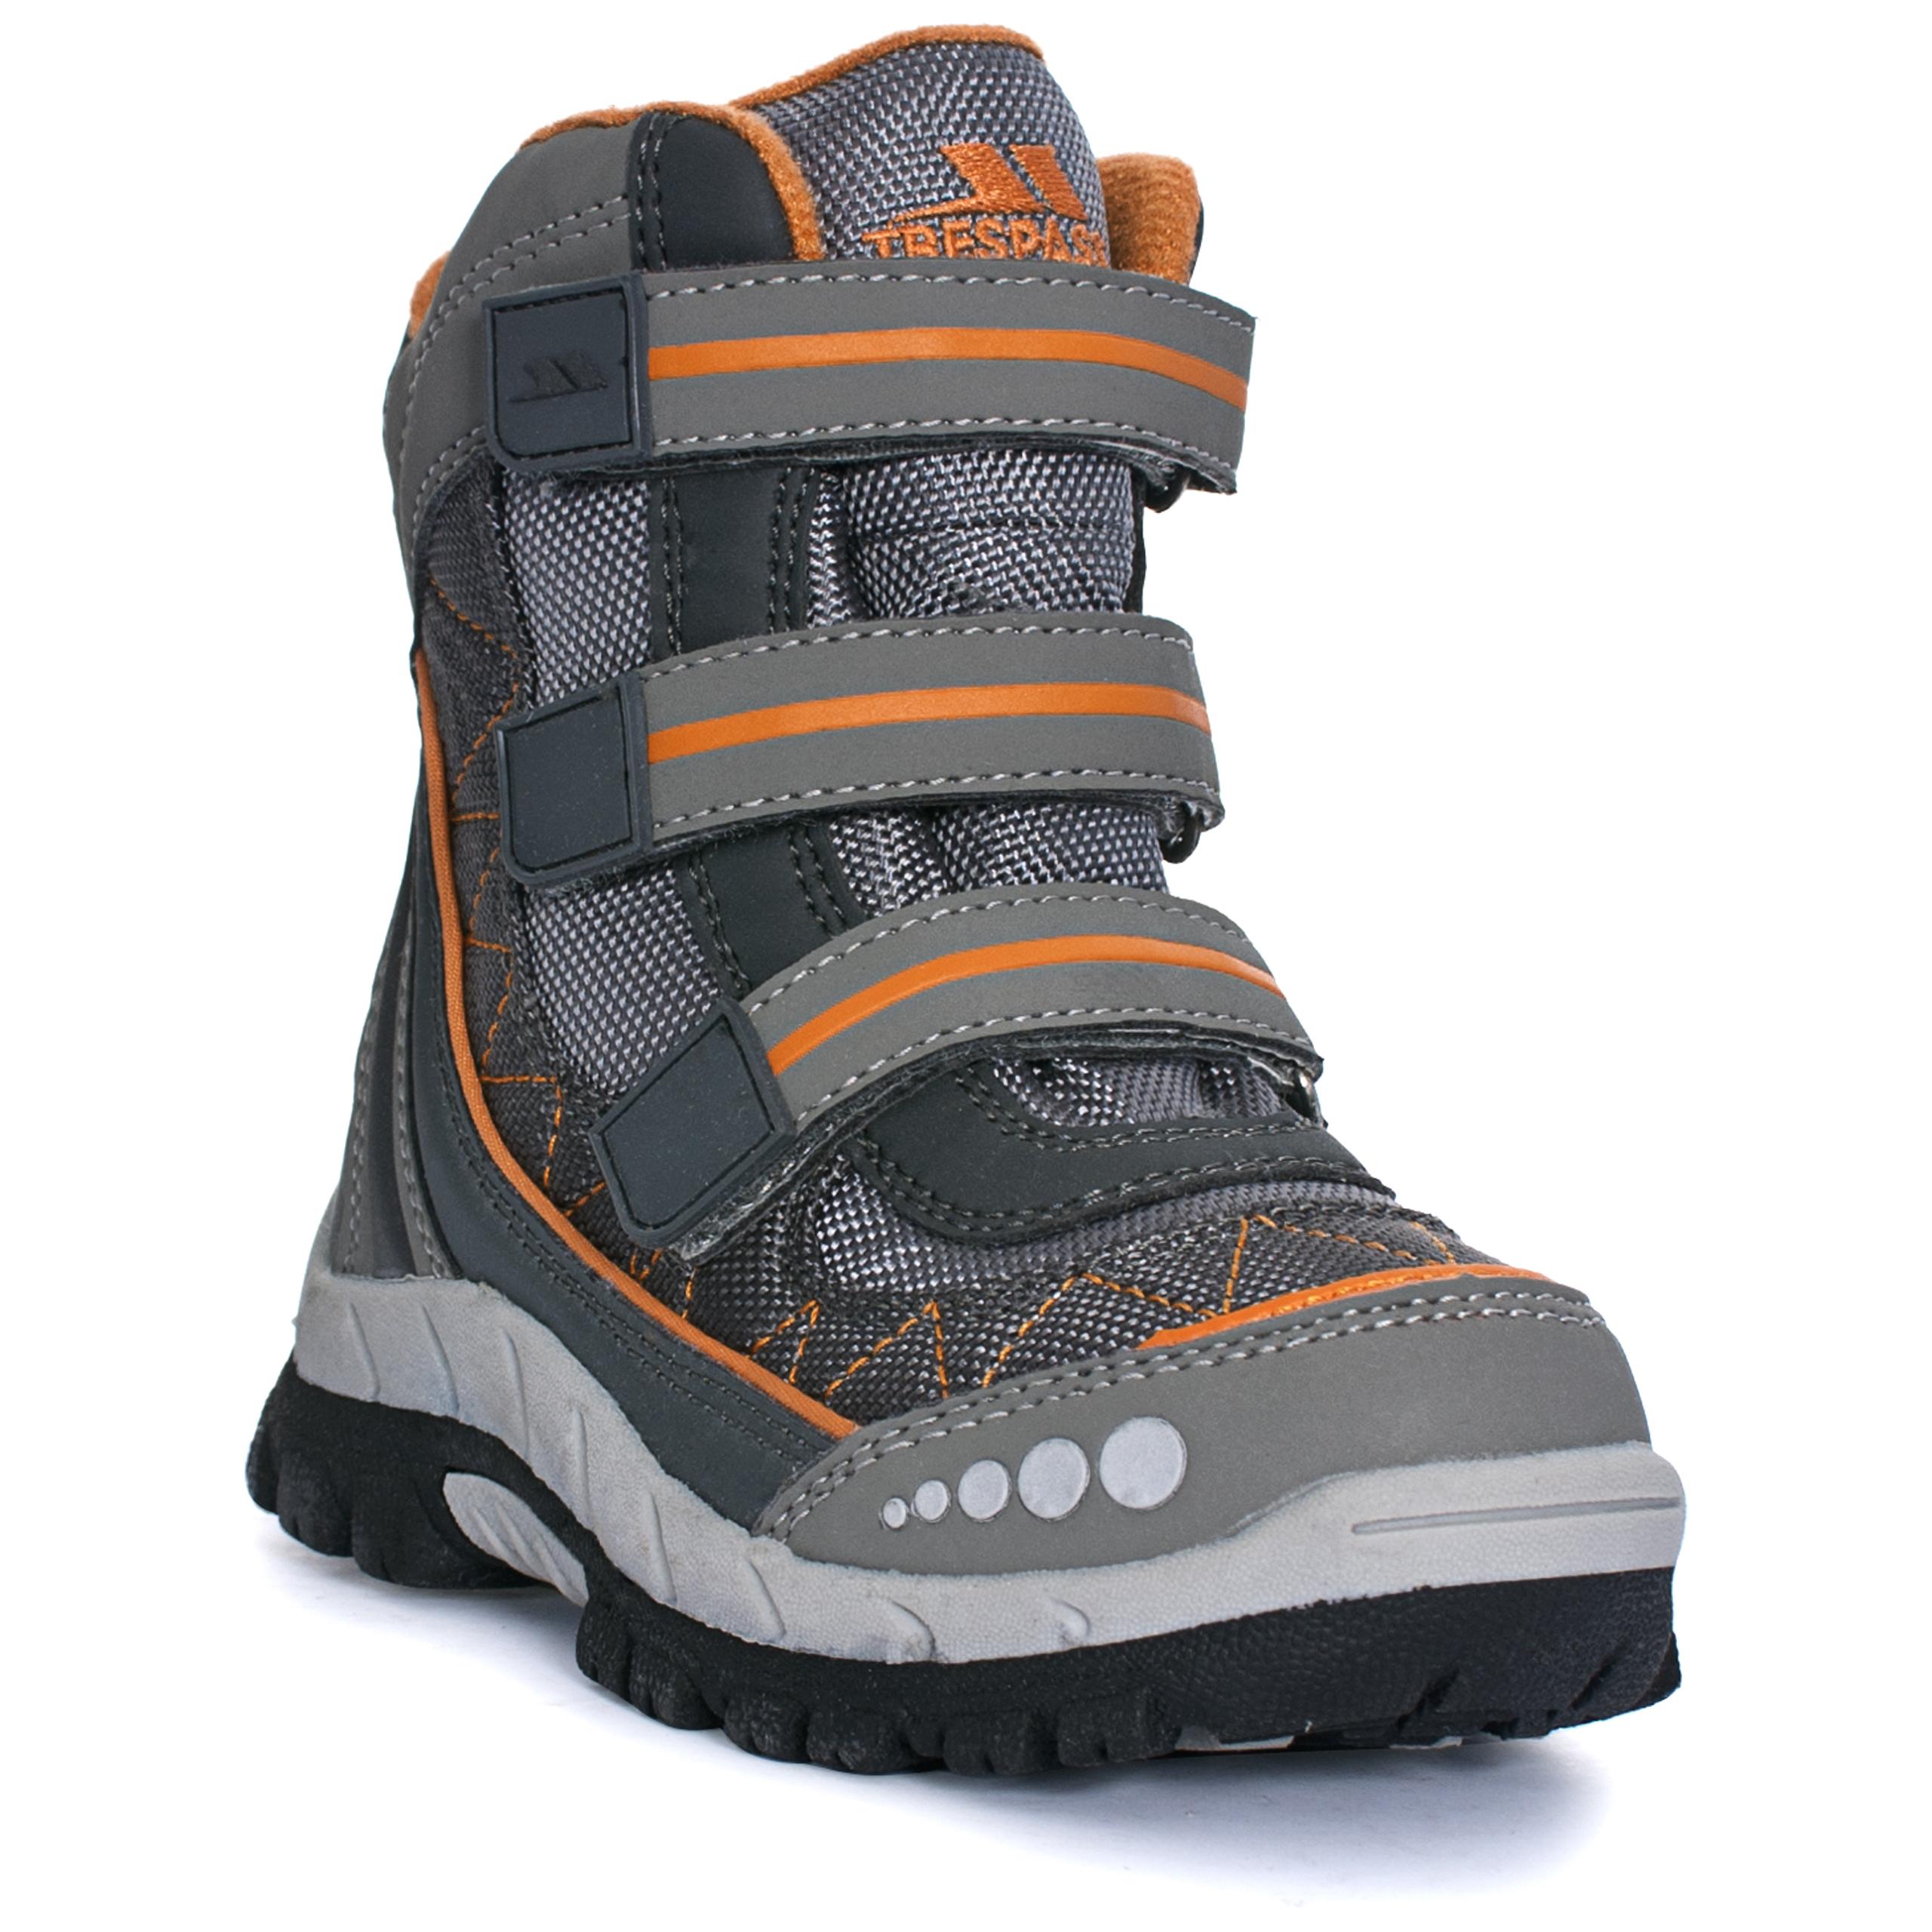 Ladies Trespass Waterproof Snow Boots   Santa Barbara Institute ...